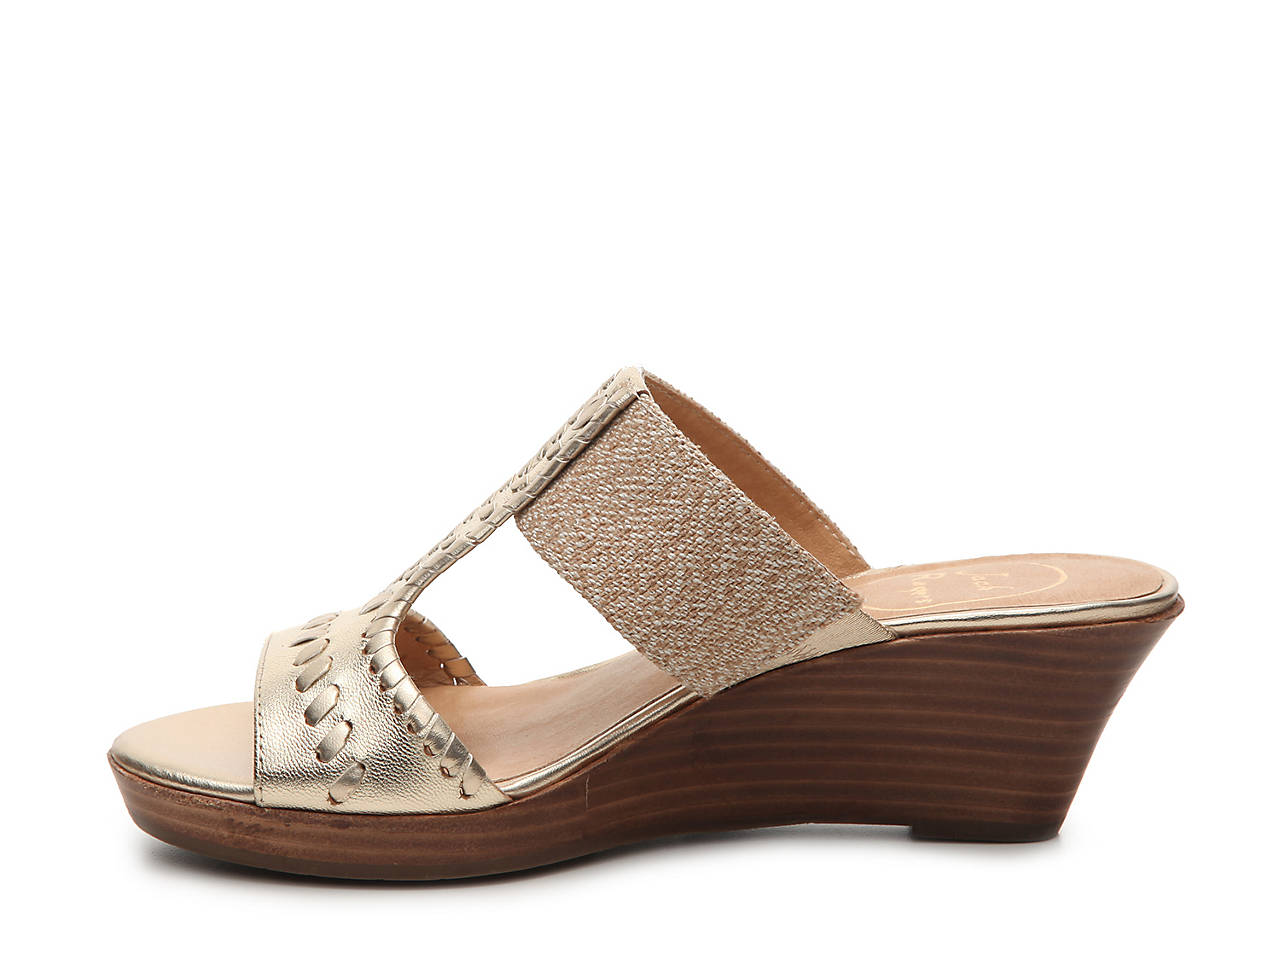 ee35c29624b Jack Rogers Nora Wedge Sandal Women s Shoes